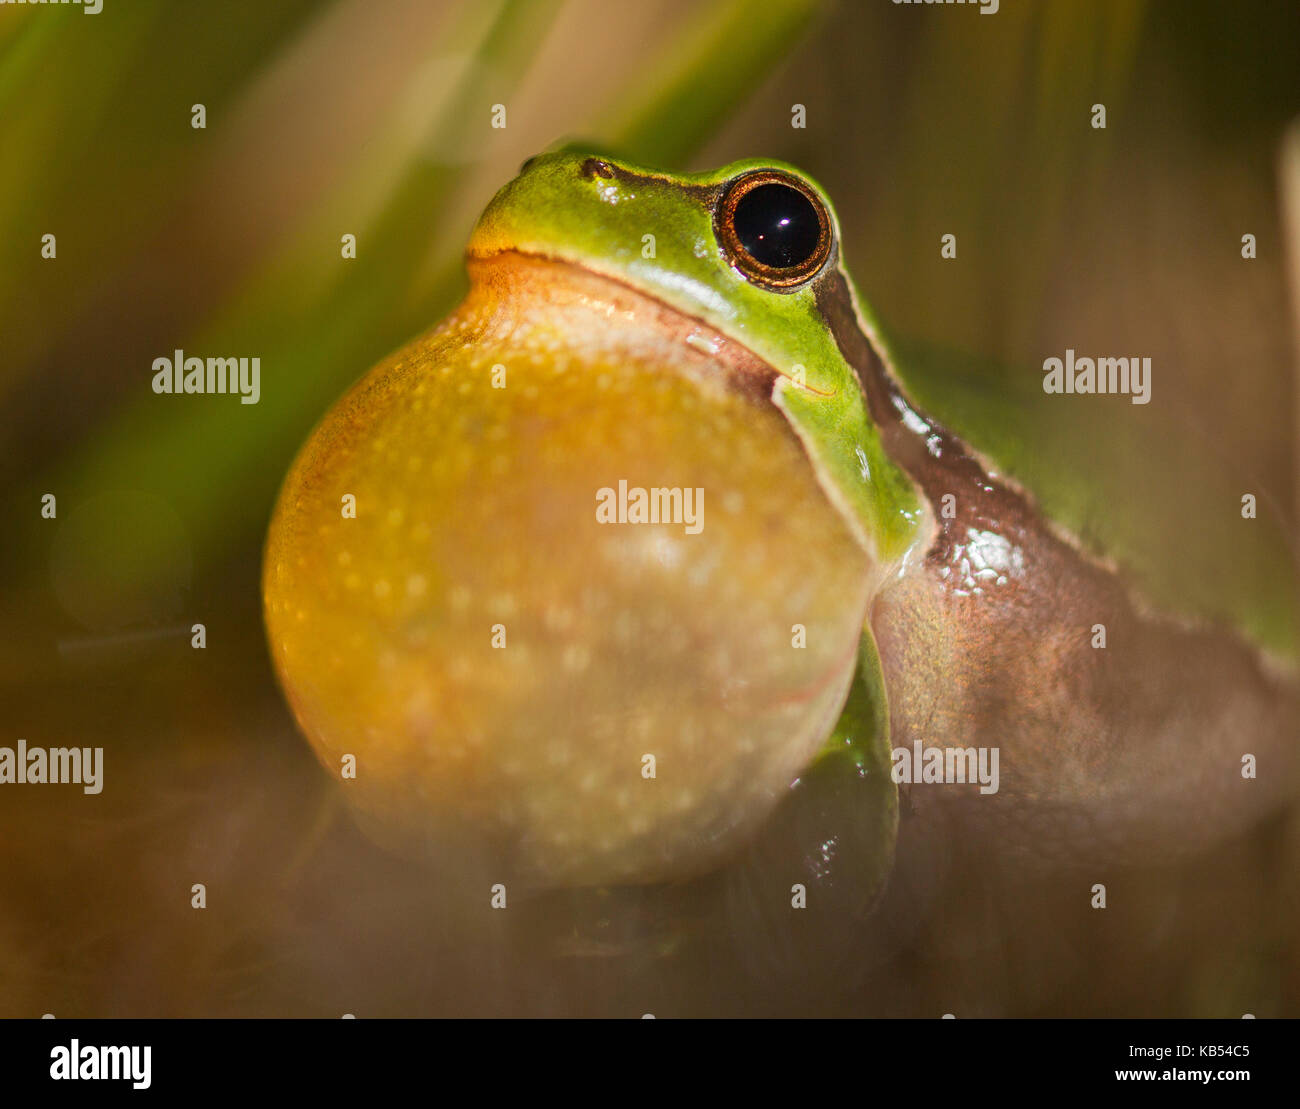 European Tree Frog (Hyla arborea) portrait, croaking, The Netherlands - Stock Image